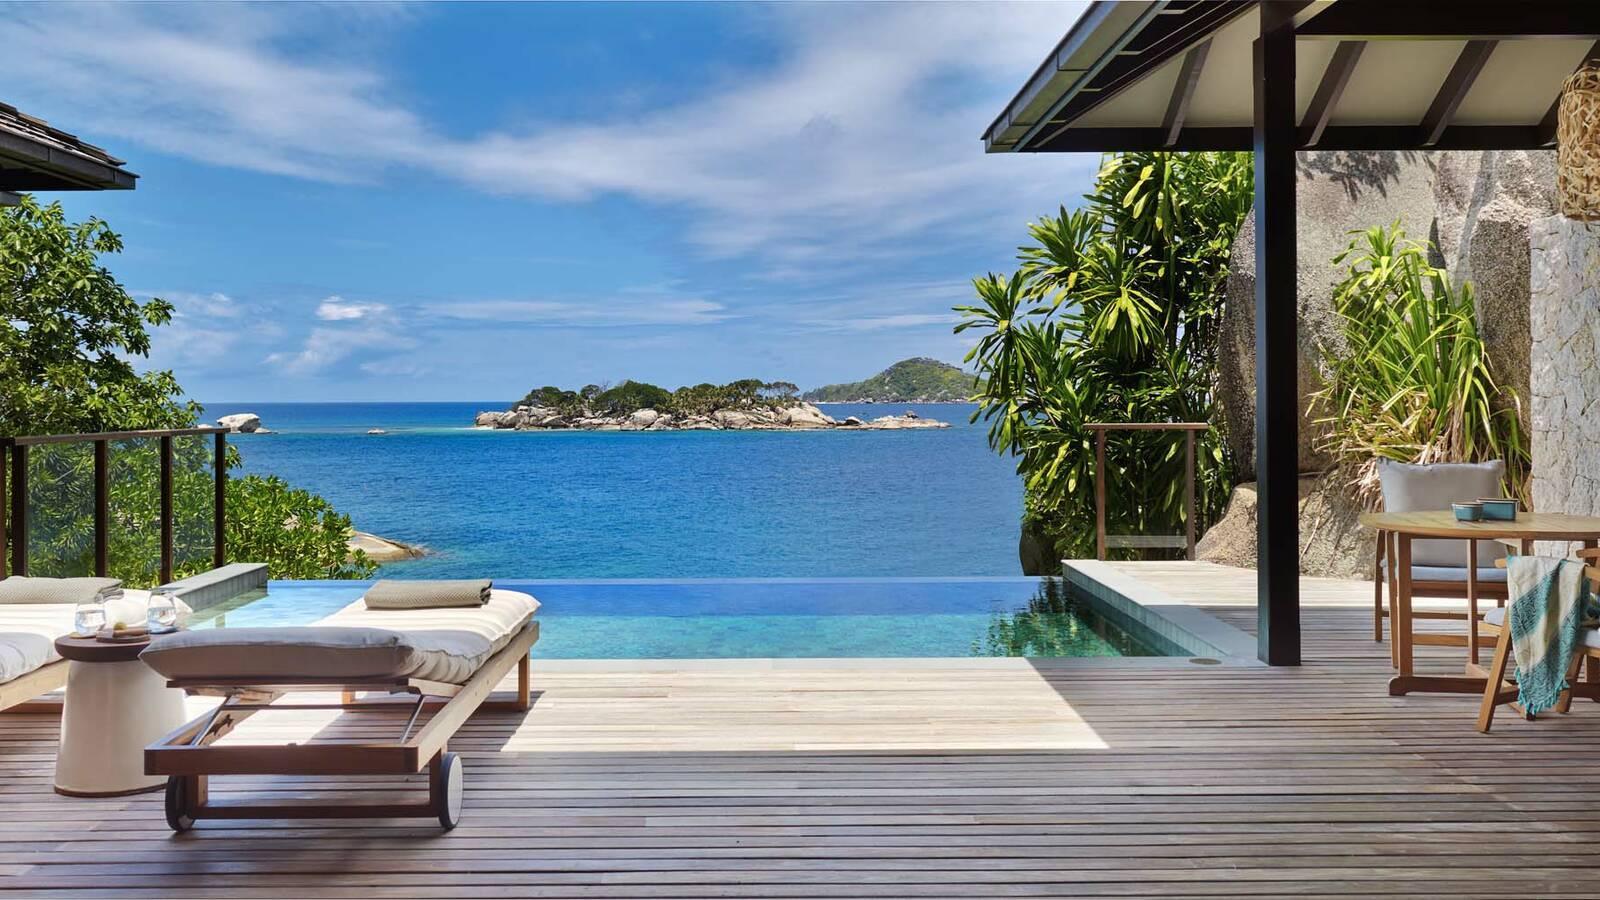 Seychelles Six Senses Zil Pasyon ocean front pool villa